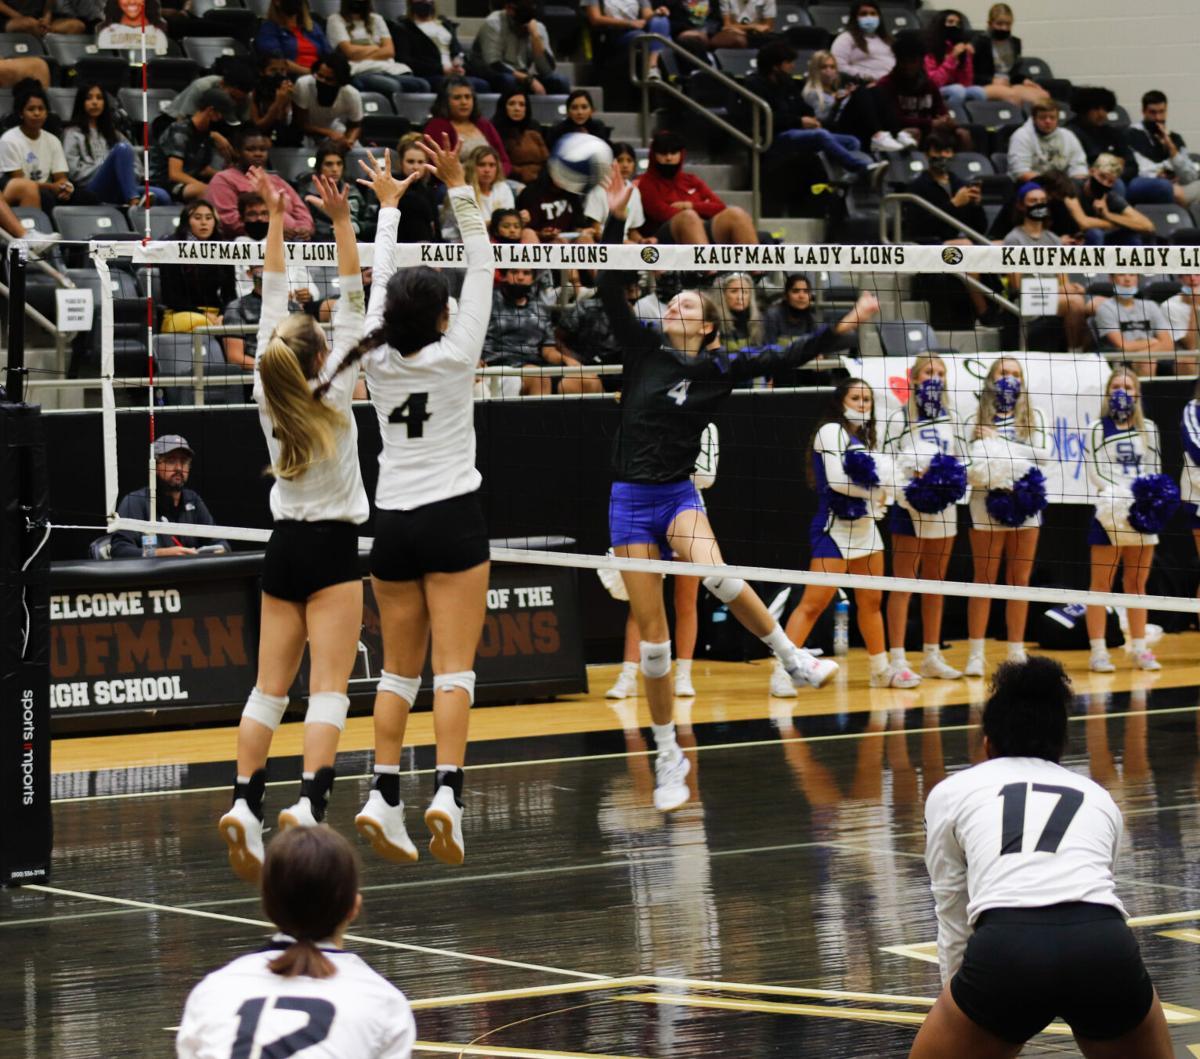 KHS volleyball blocks